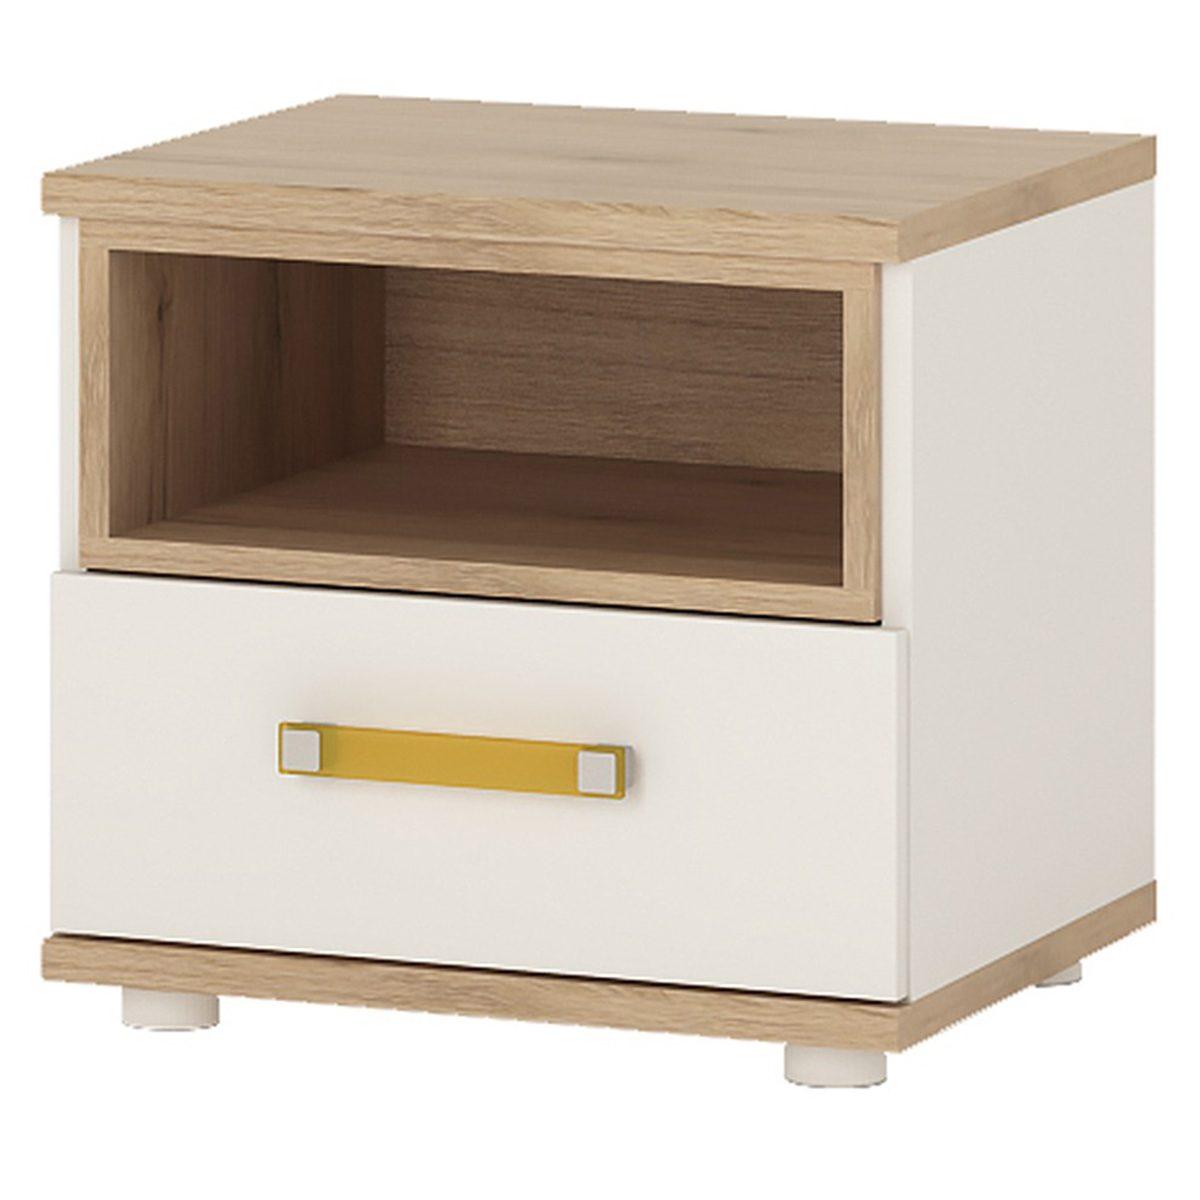 Ikids Kids White Amp Oak Bedside Cabinet With Coloured